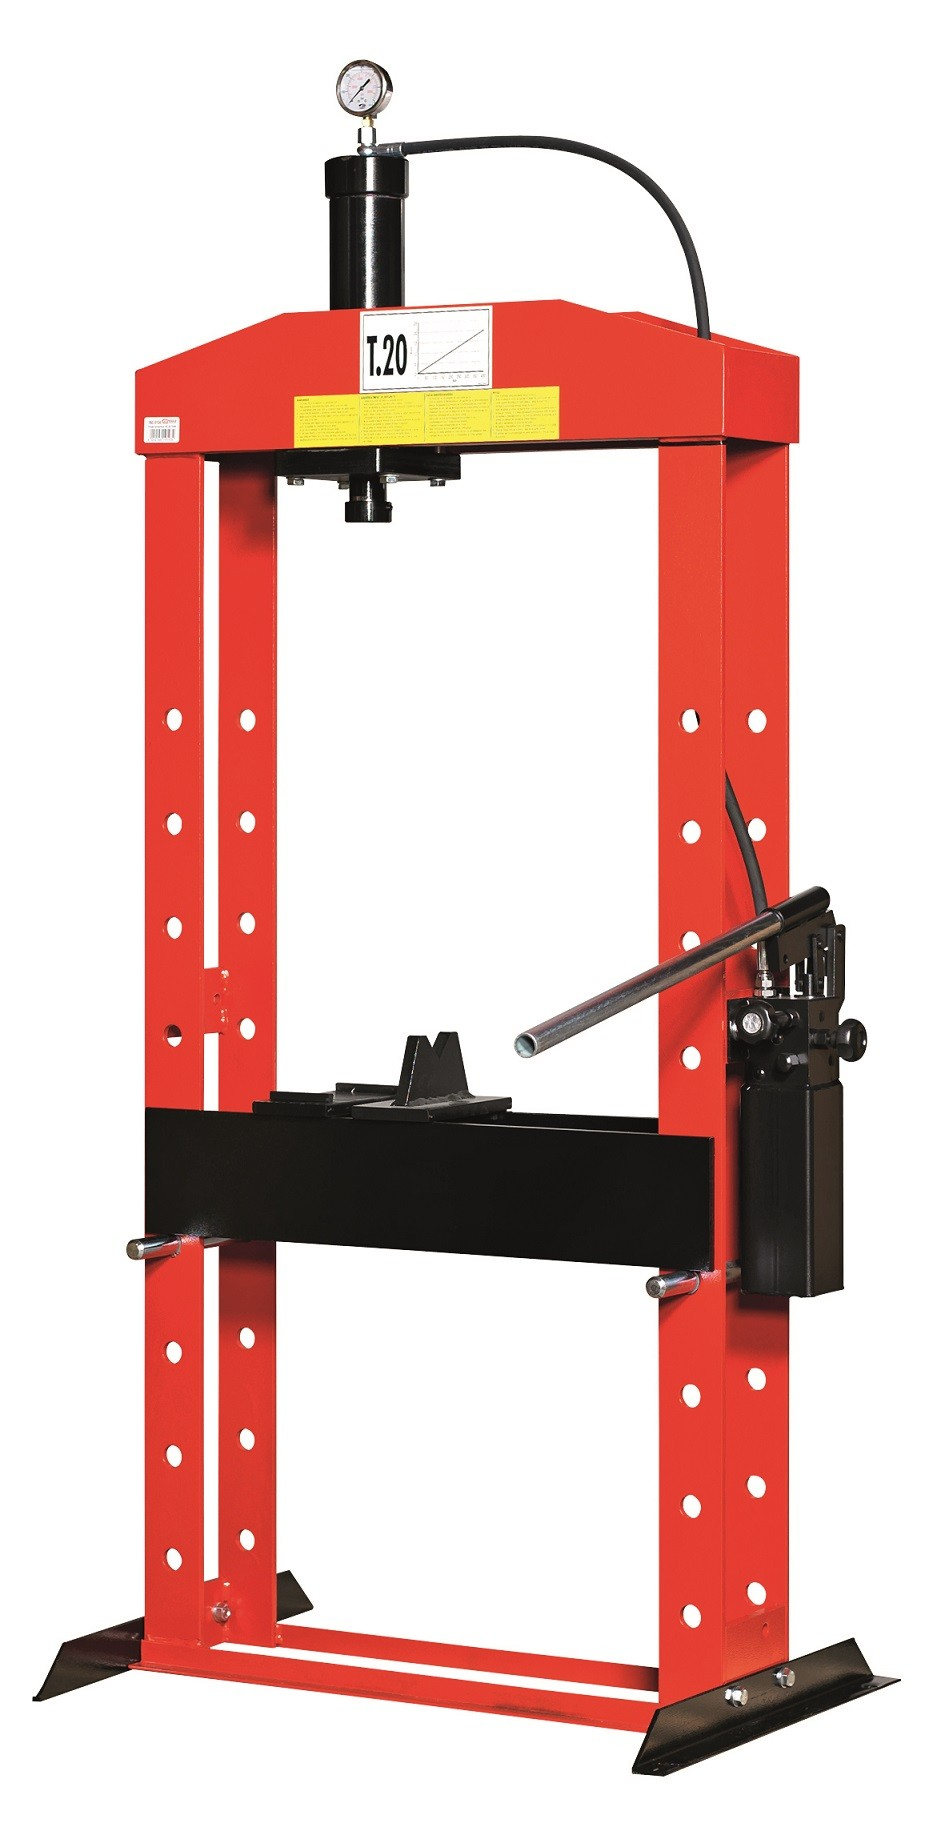 marolotest presse hydraulique 20 tonnes. Black Bedroom Furniture Sets. Home Design Ideas